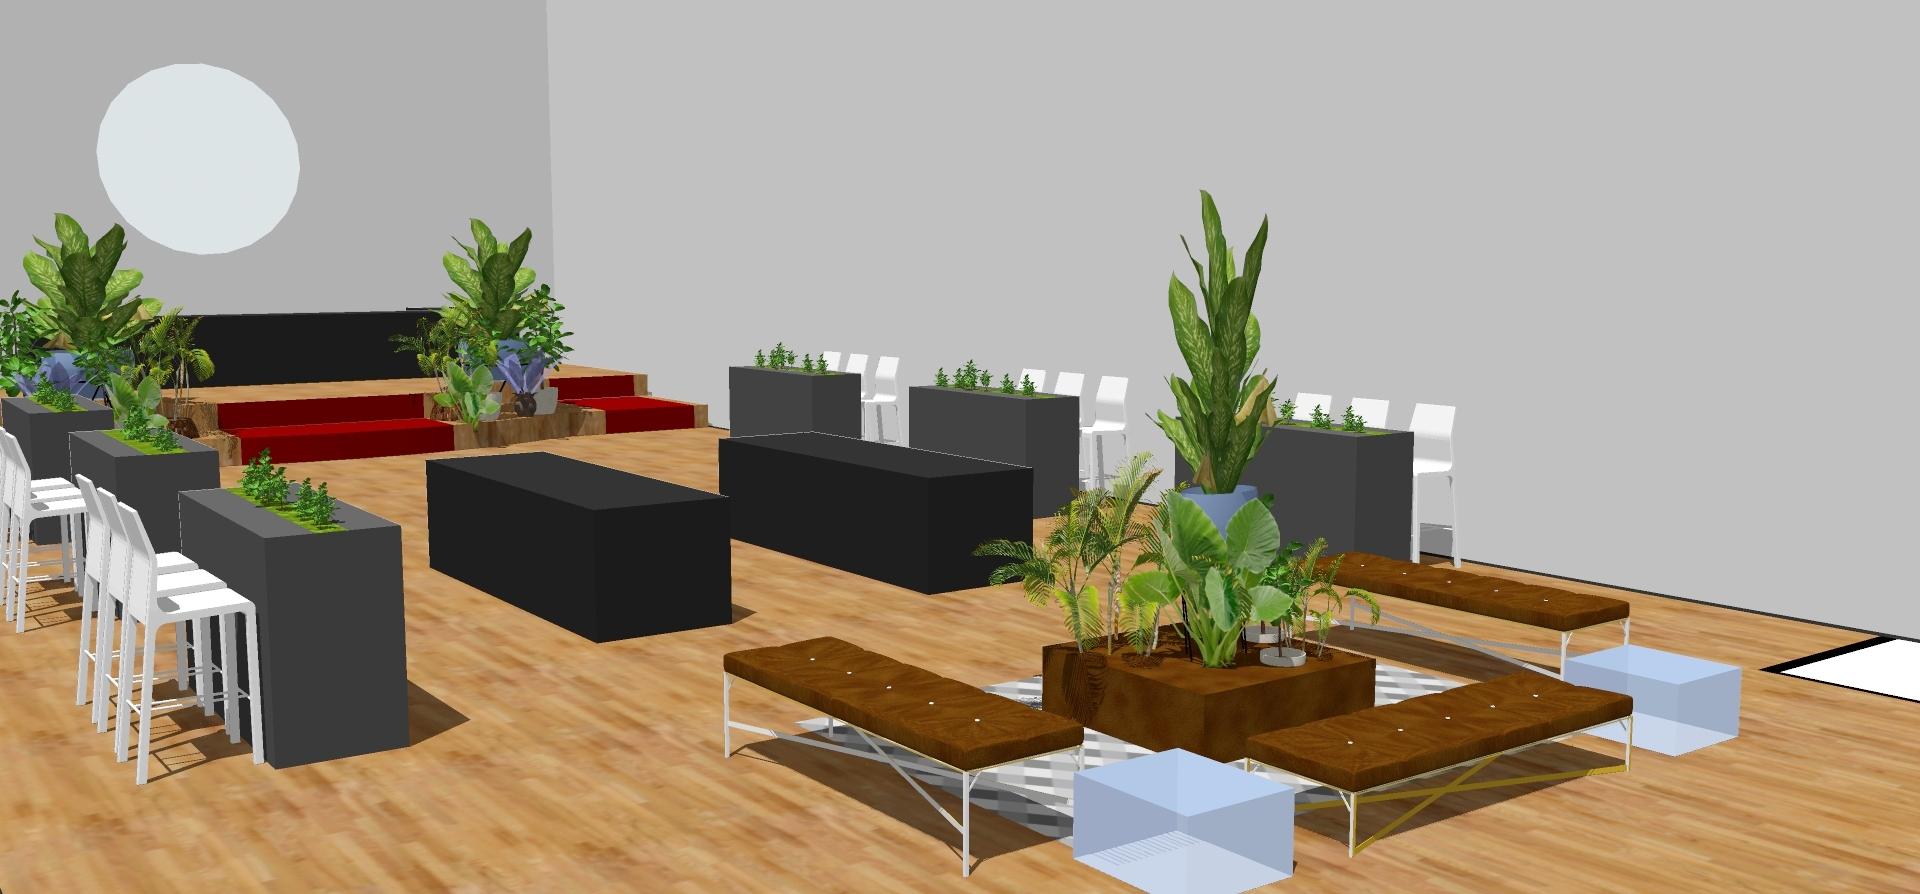 Renderings & Custom Interior Design -